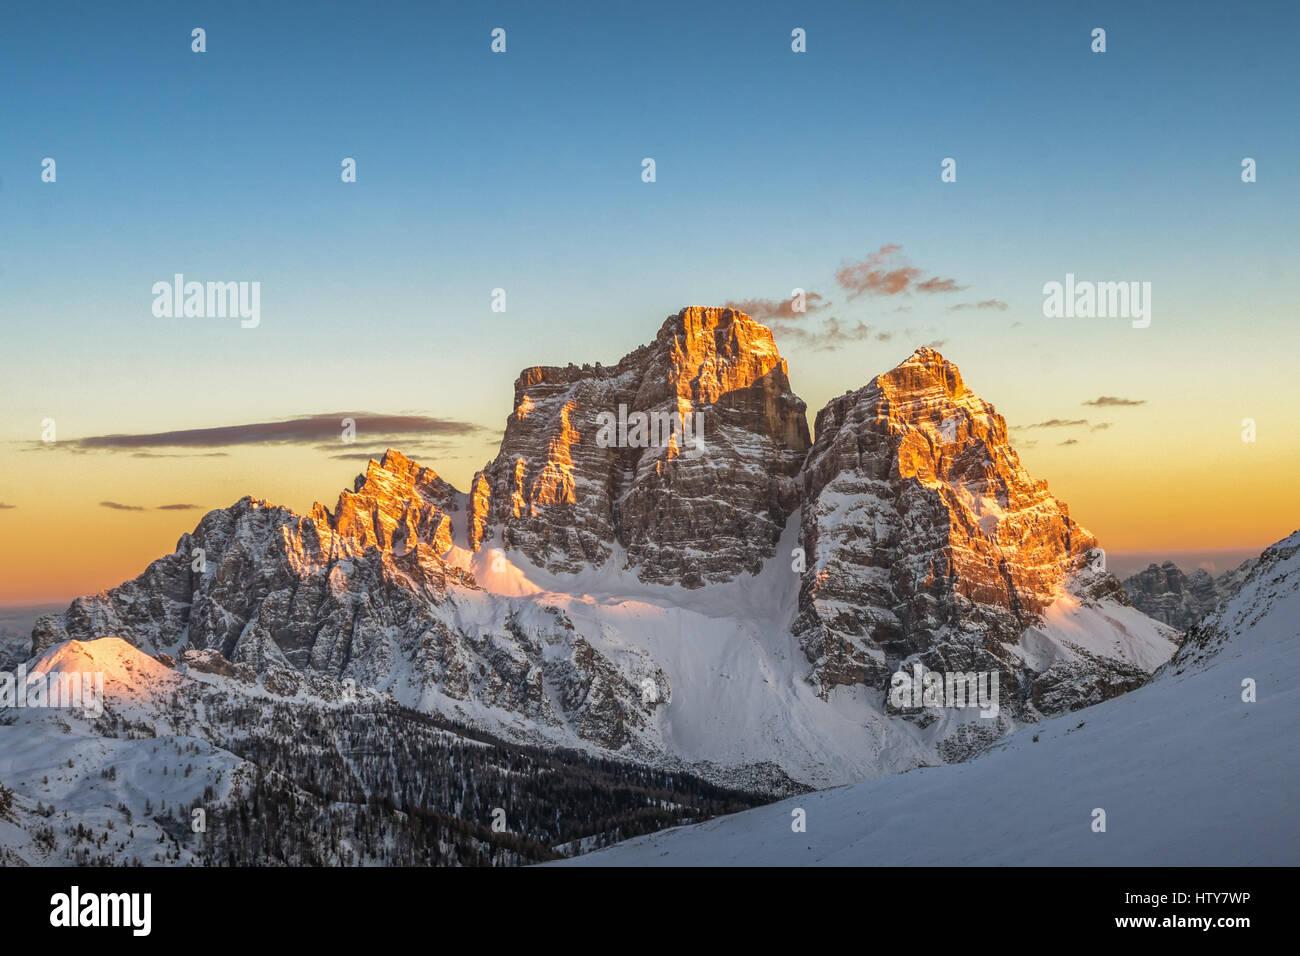 Mt. Pelmo on Mondeval near Cortina d`ampezzo at sunset with Alpenglow - Belluno - Veneto - Italy - Stock Image